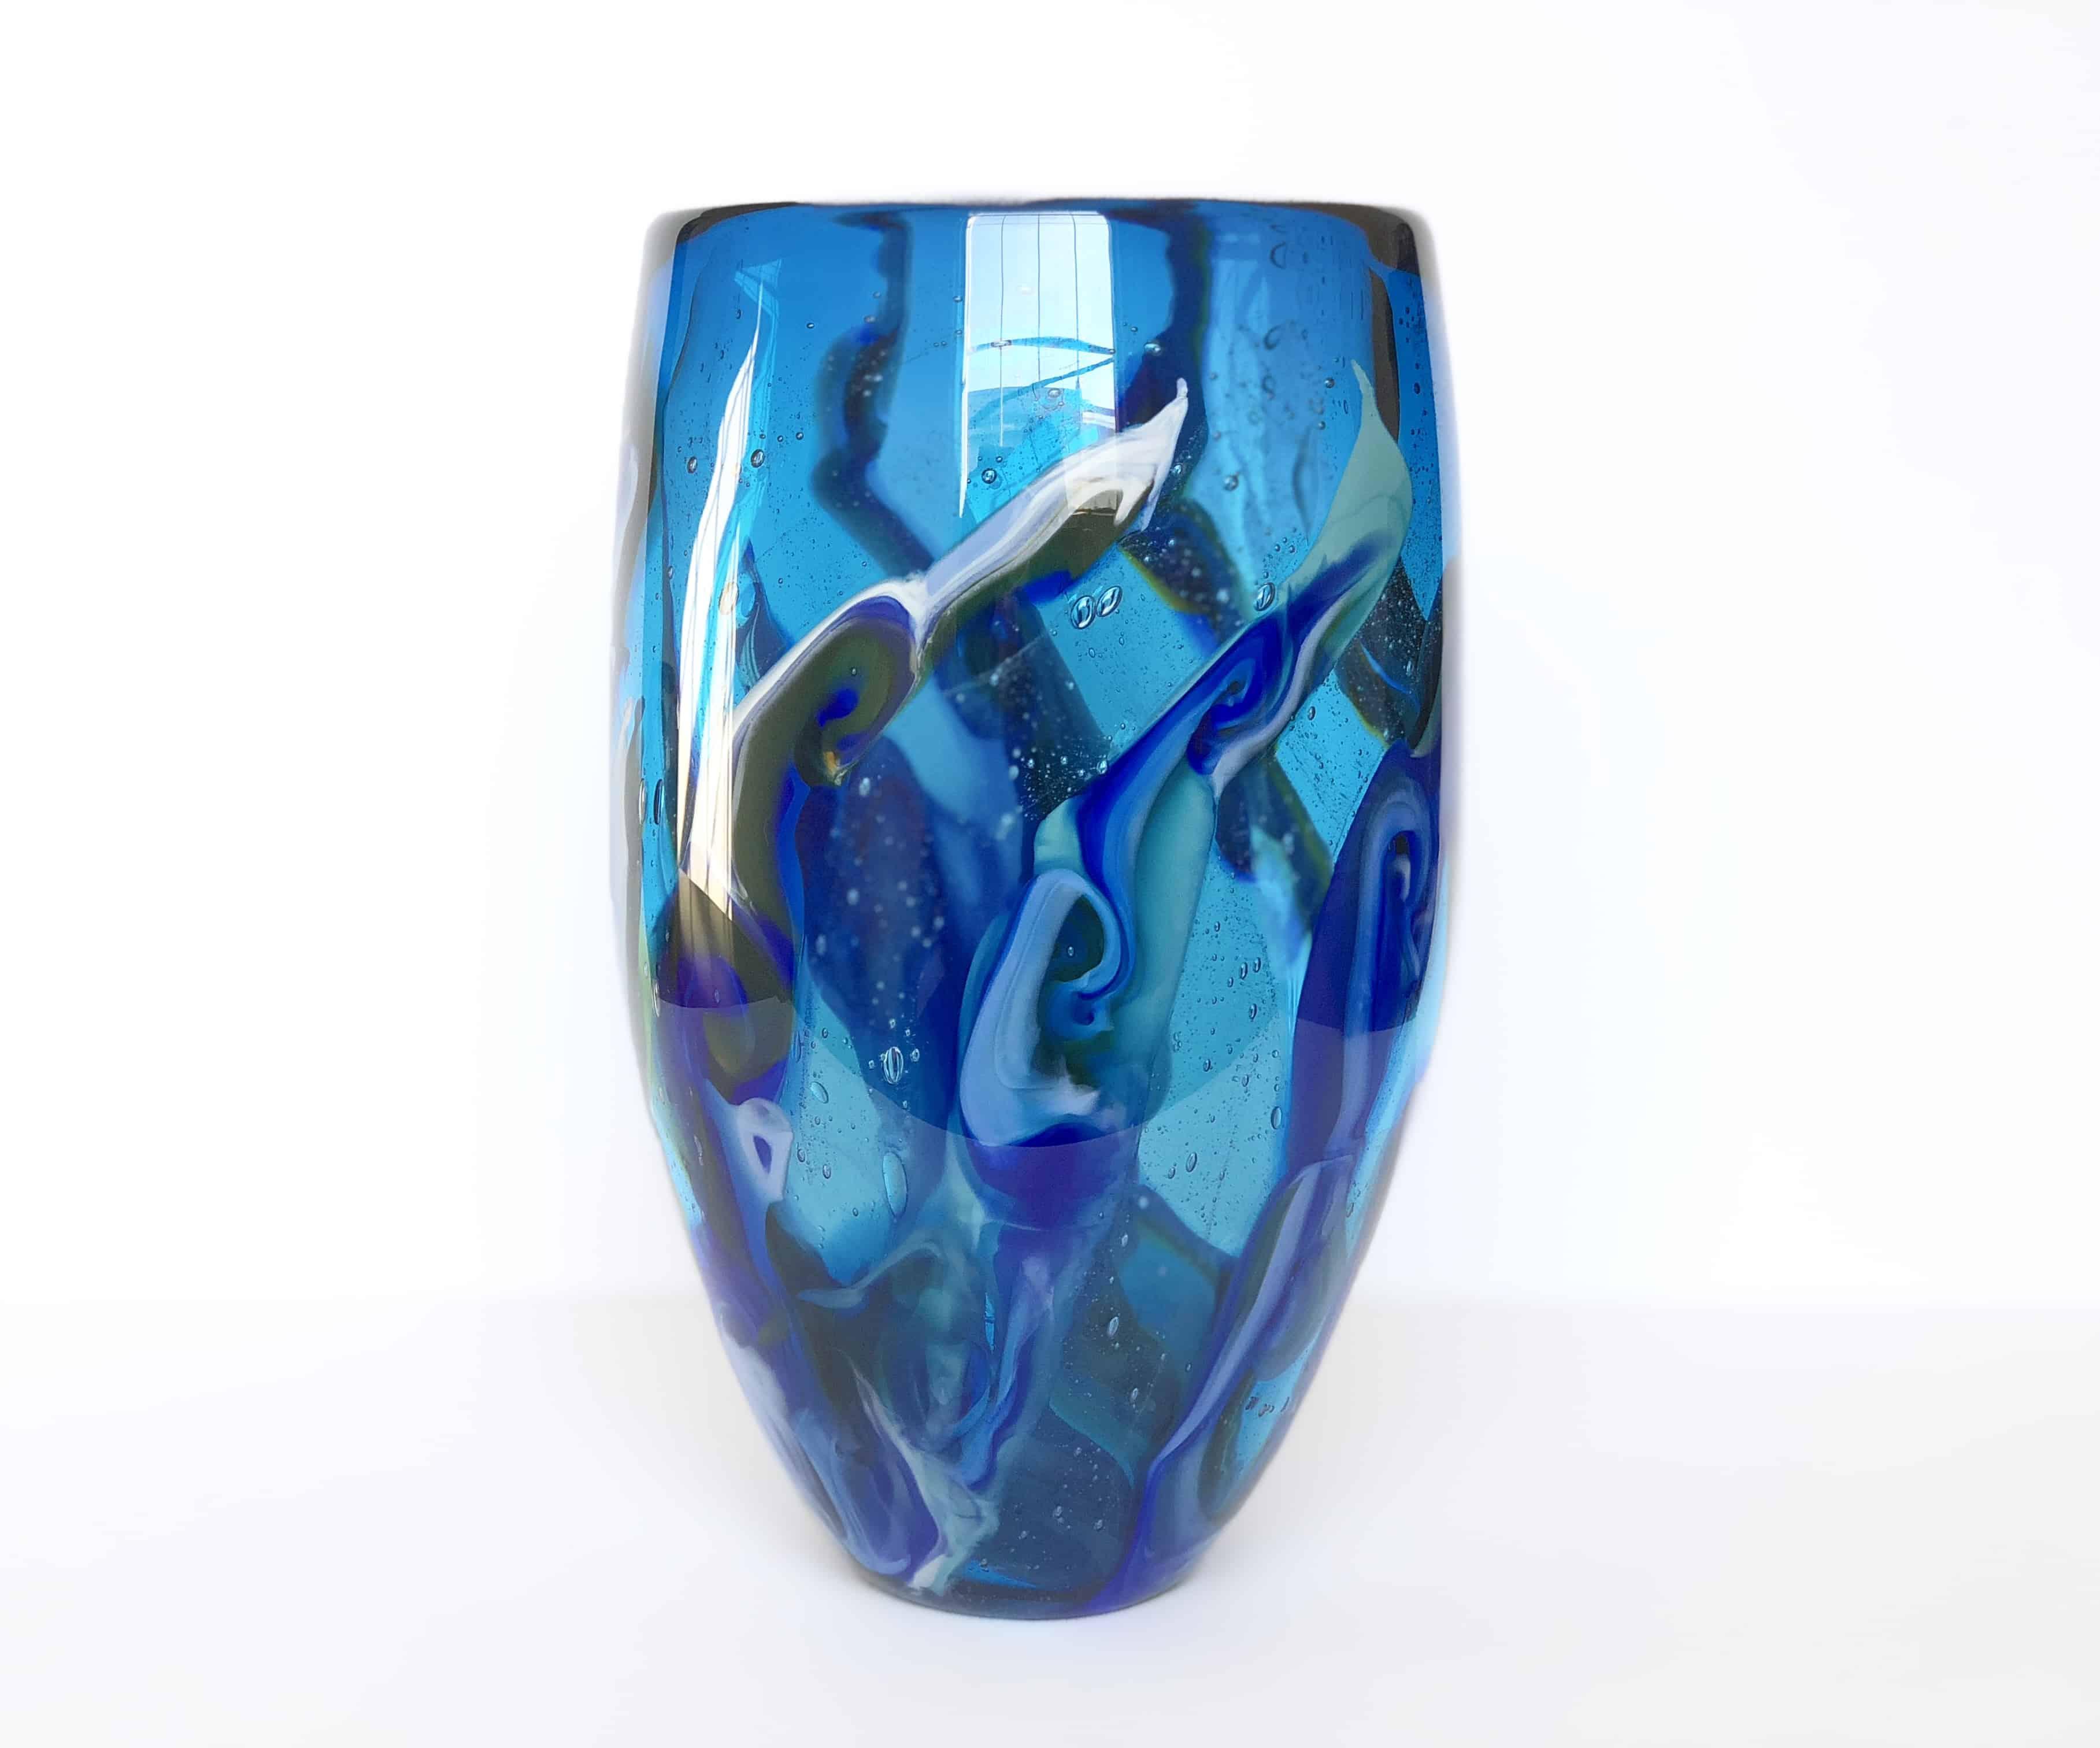 Roberta-Easton-blue-vase-under-water-1